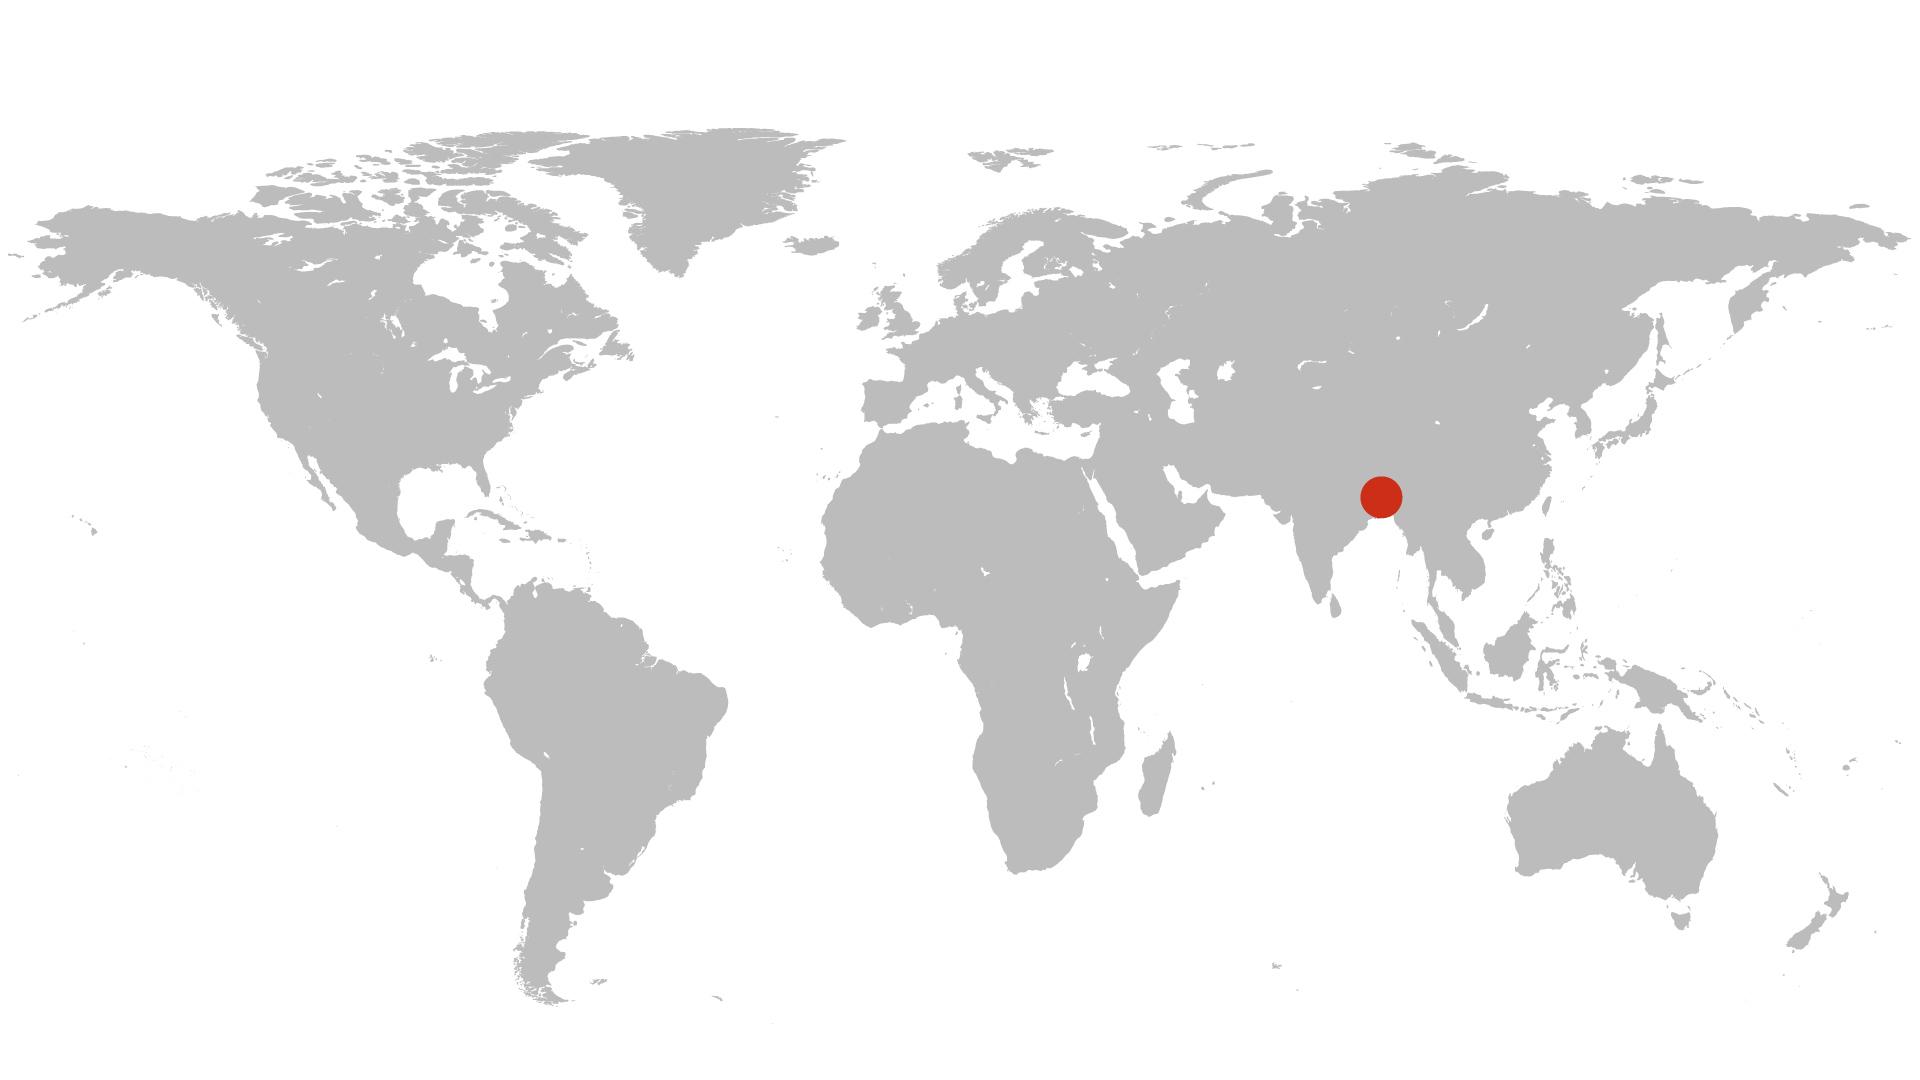 JB_WEB_World_Map_Bhutan_D02.jpg